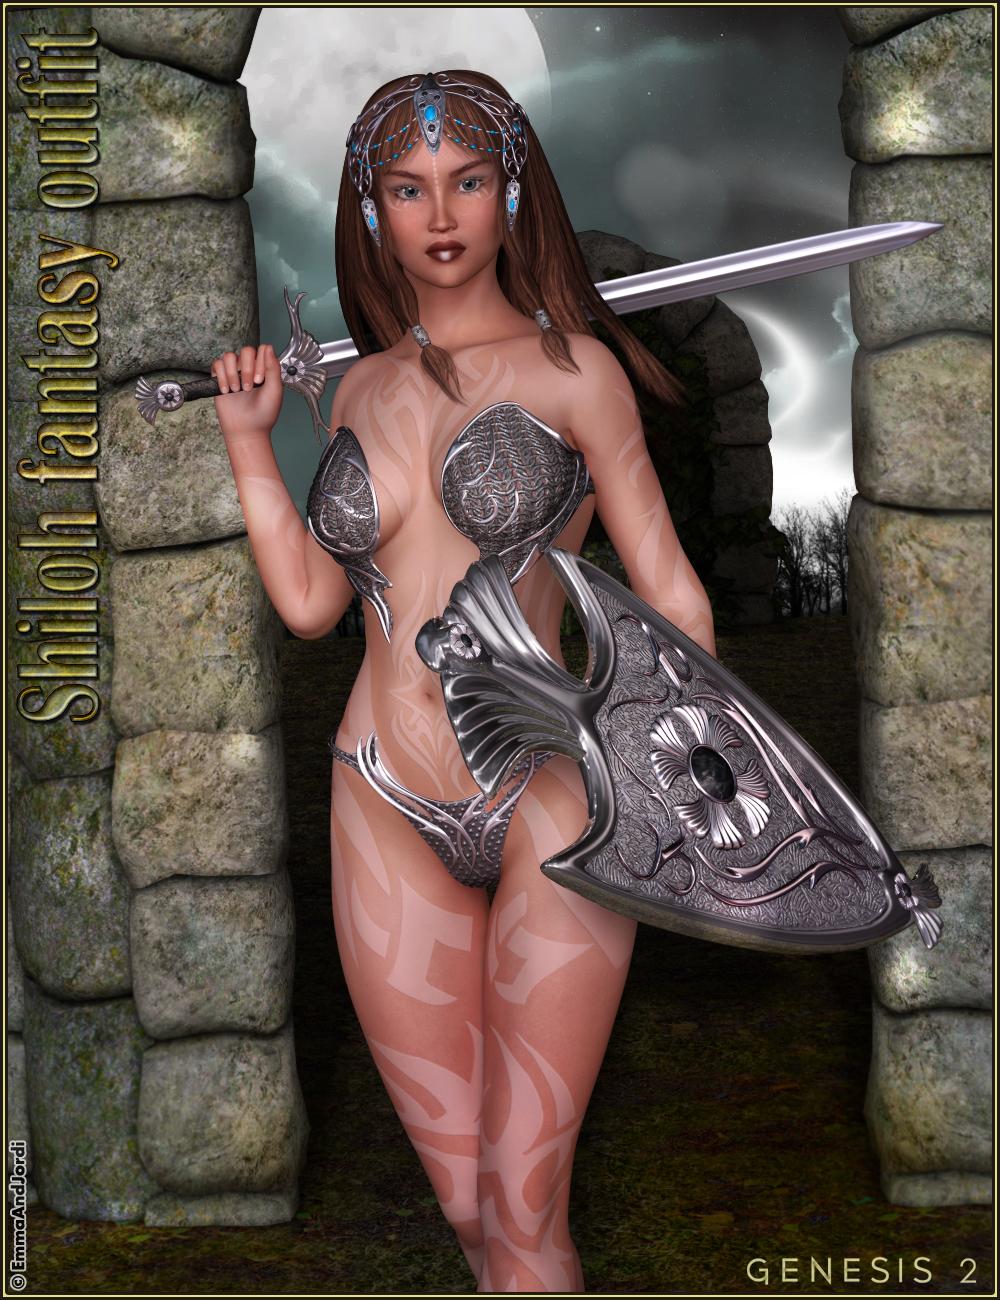 Shiloh Fantasy Outfit by: EmmaAndJordi, 3D Models by Daz 3D